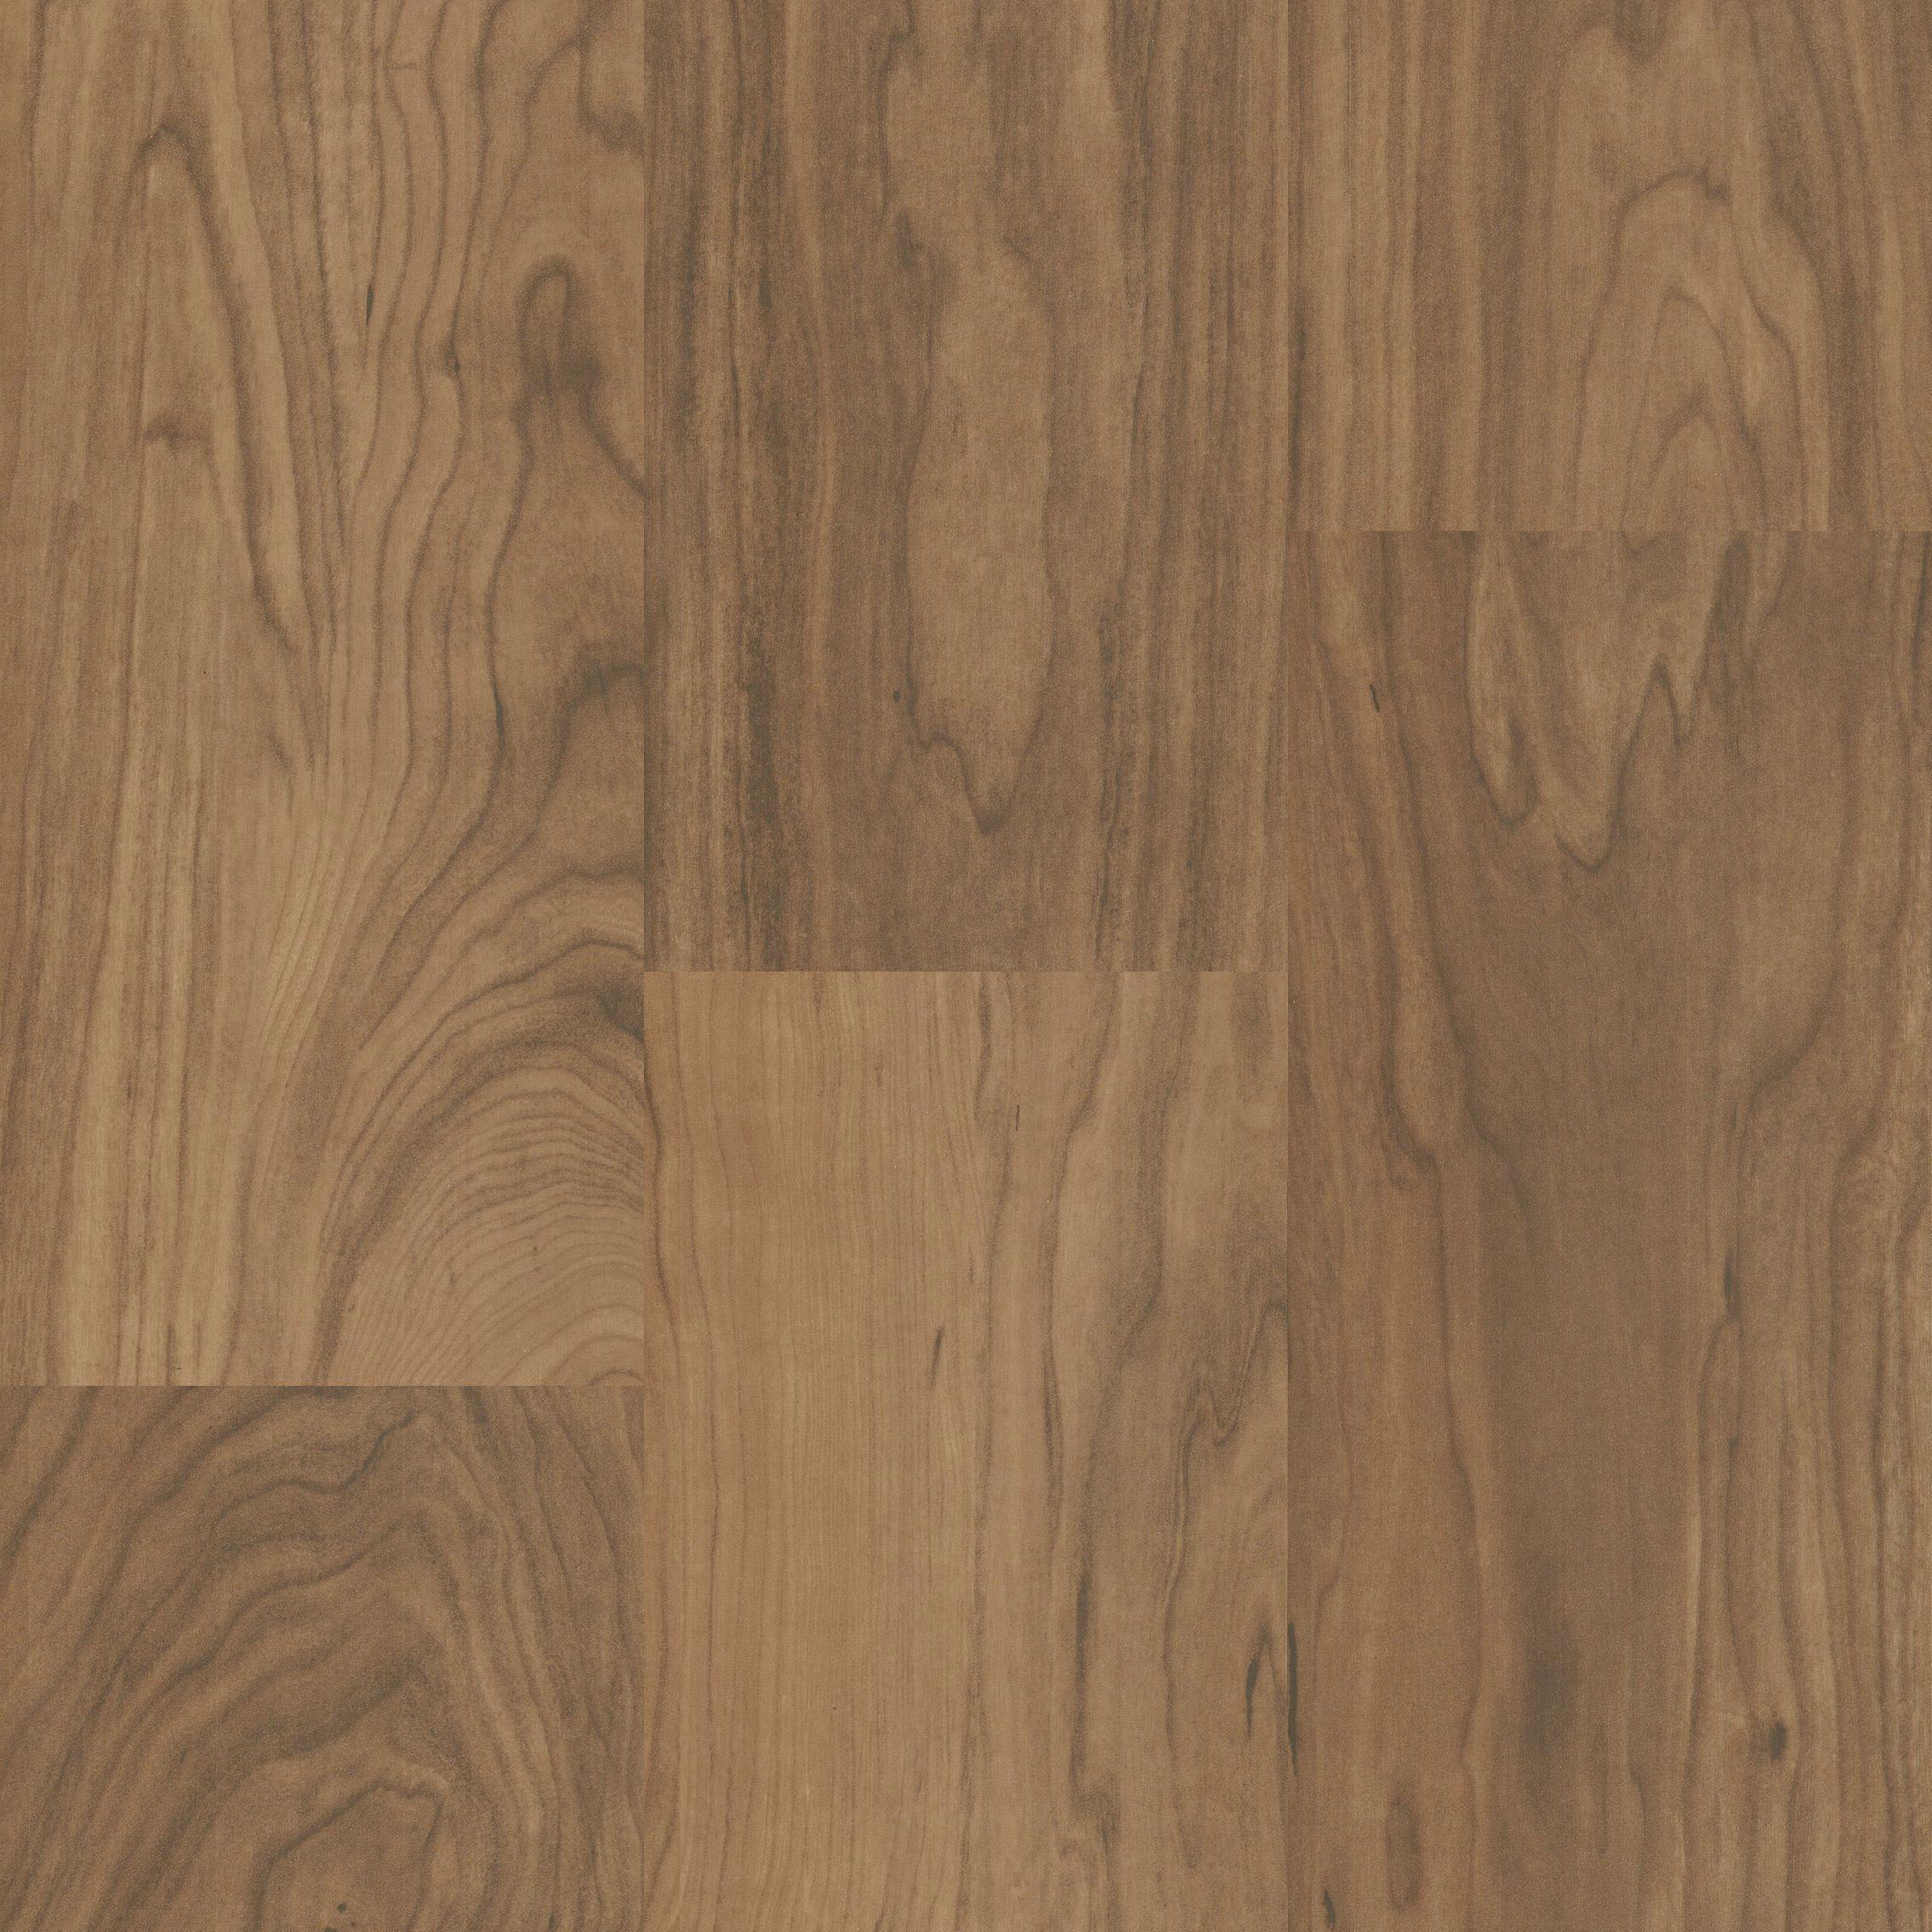 waterproof engineered hardwood flooring of ivc georgia cherry 7 56 waterproof click together lvt vinyl plank with regard to ivc georgia cherry 7 56 waterproof click together lvt vinyl plank flooring